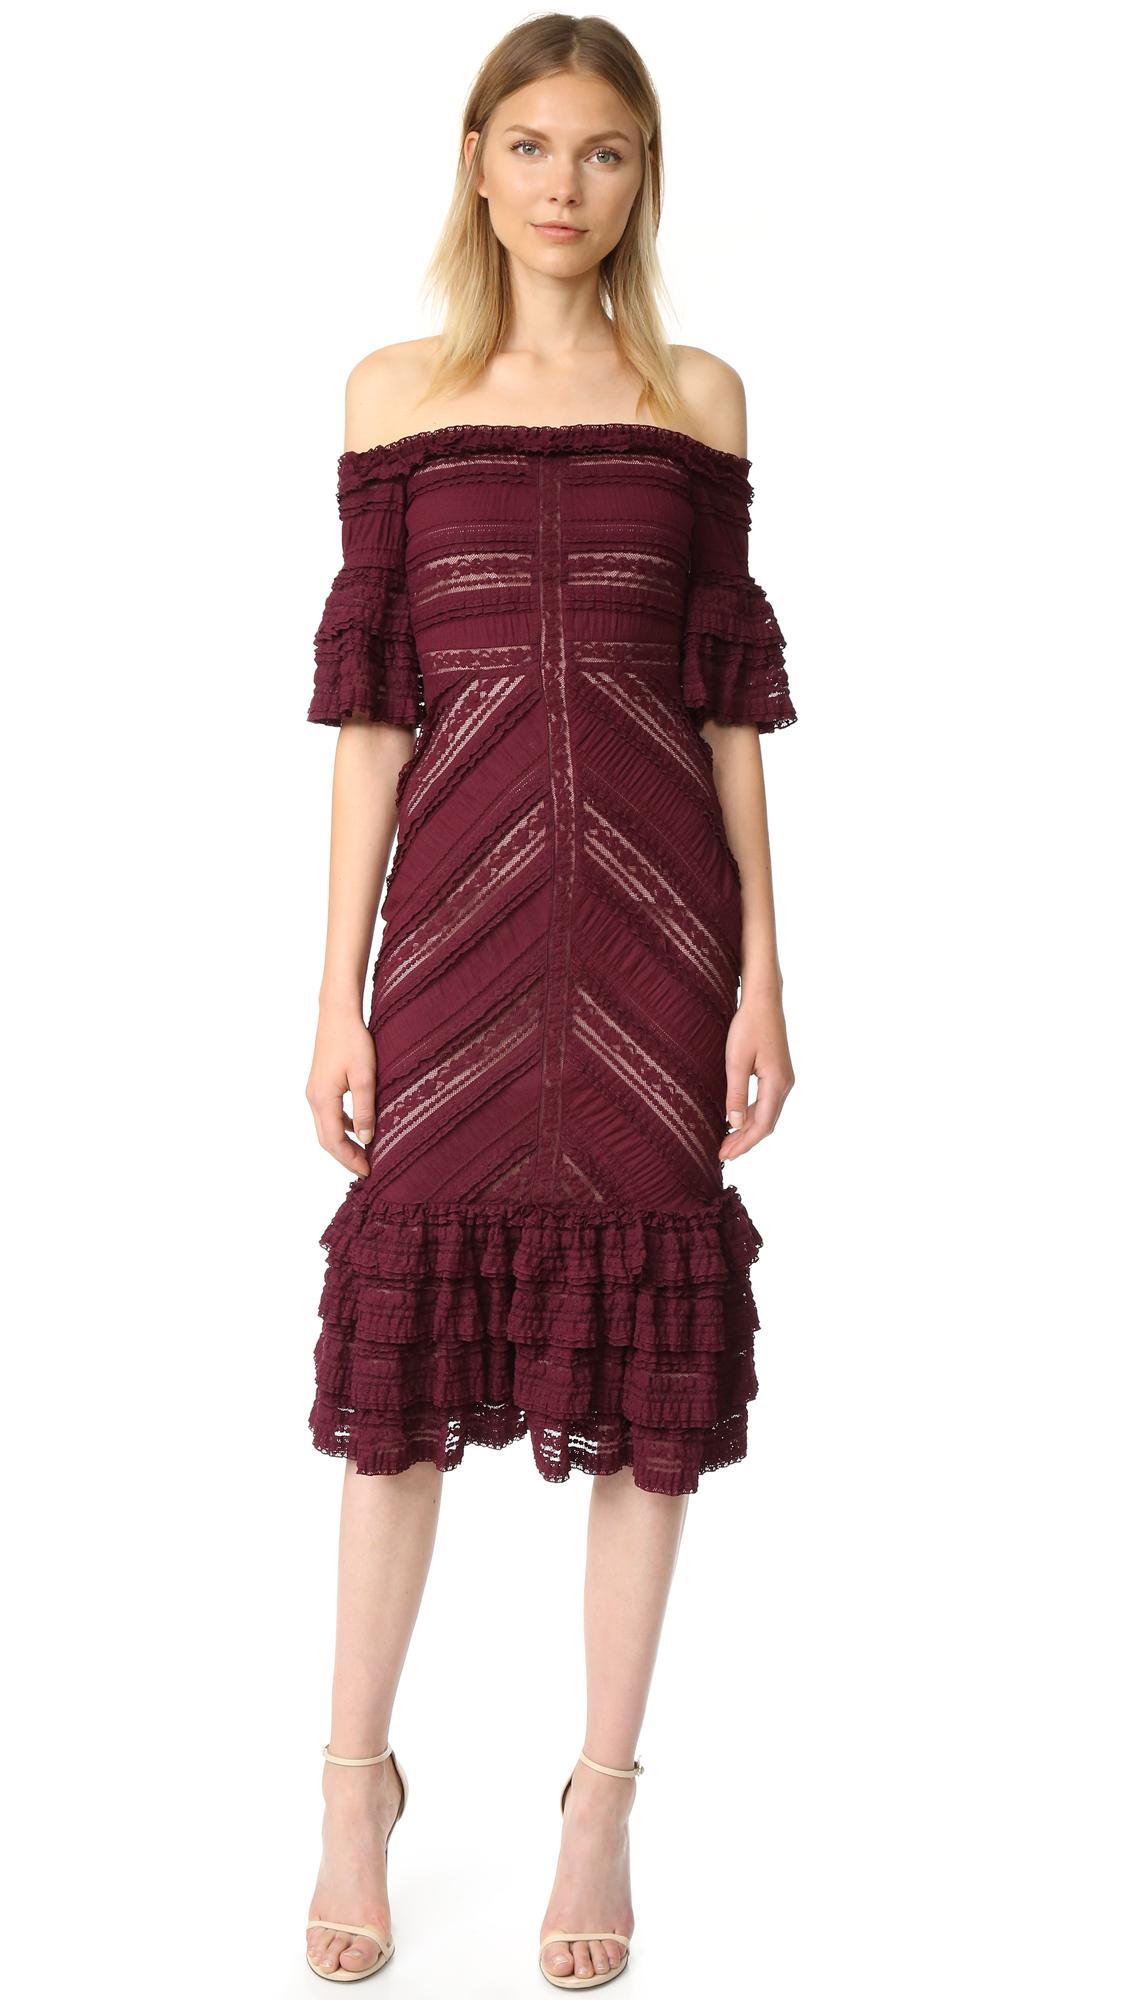 Cinq 192 Sept Lace Naya Dress In Purple Lyst